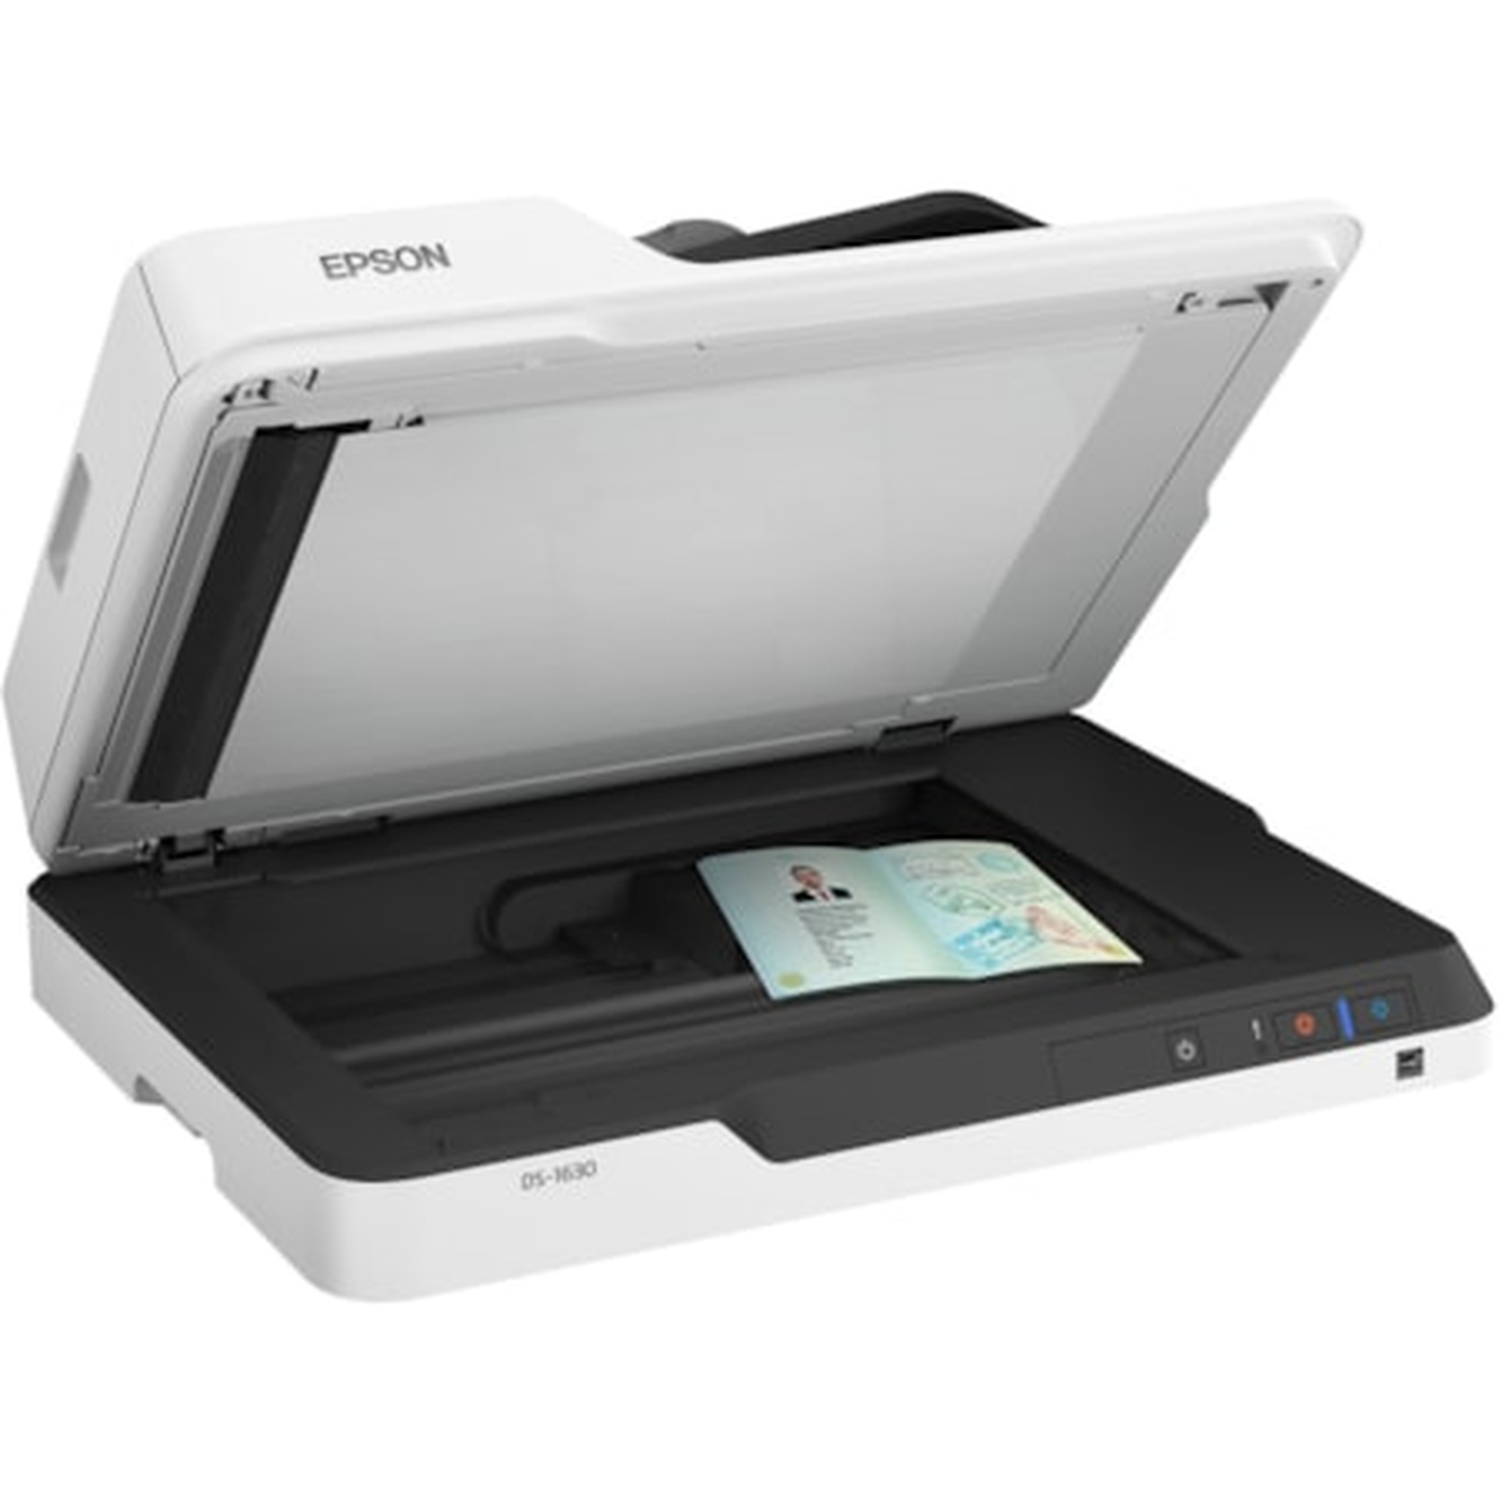 Epson WorkForce DS-1630 Sheetfed/Flatbed Scanner - 1200 dpi Optical